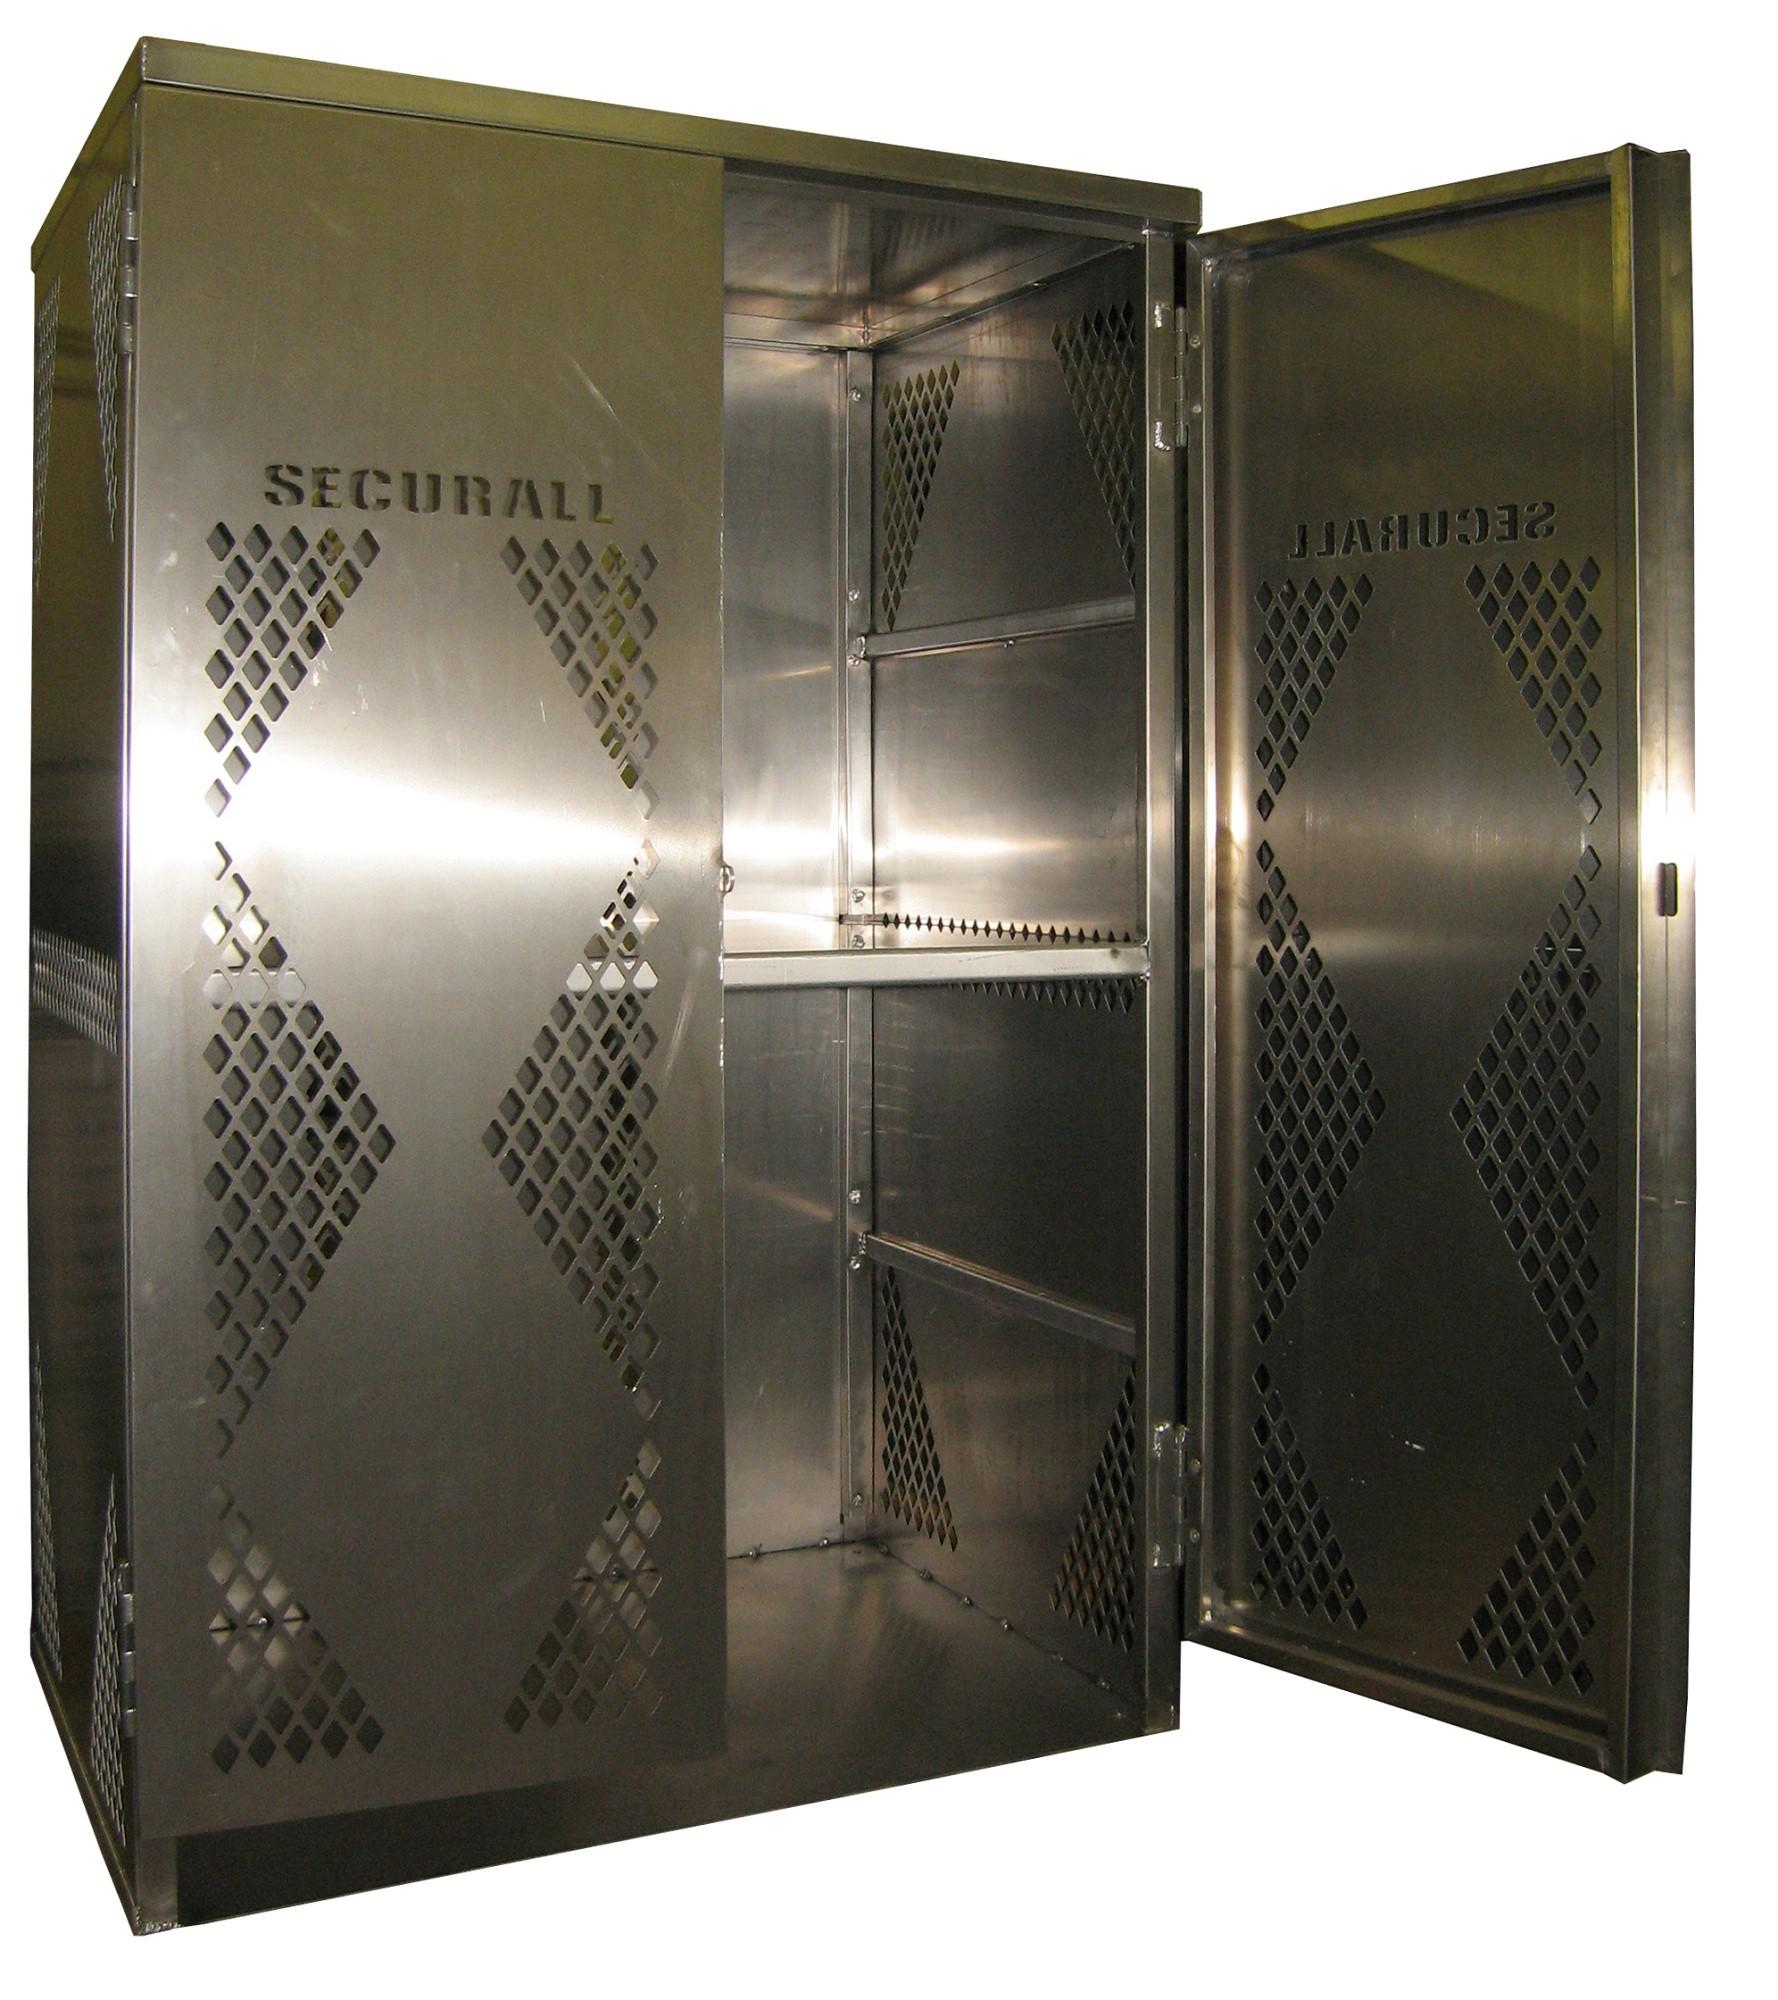 LP12 - Vertical - LP/Oxygen Storage Cabinet - 12 Cyl. Vertical Standard 2-Door